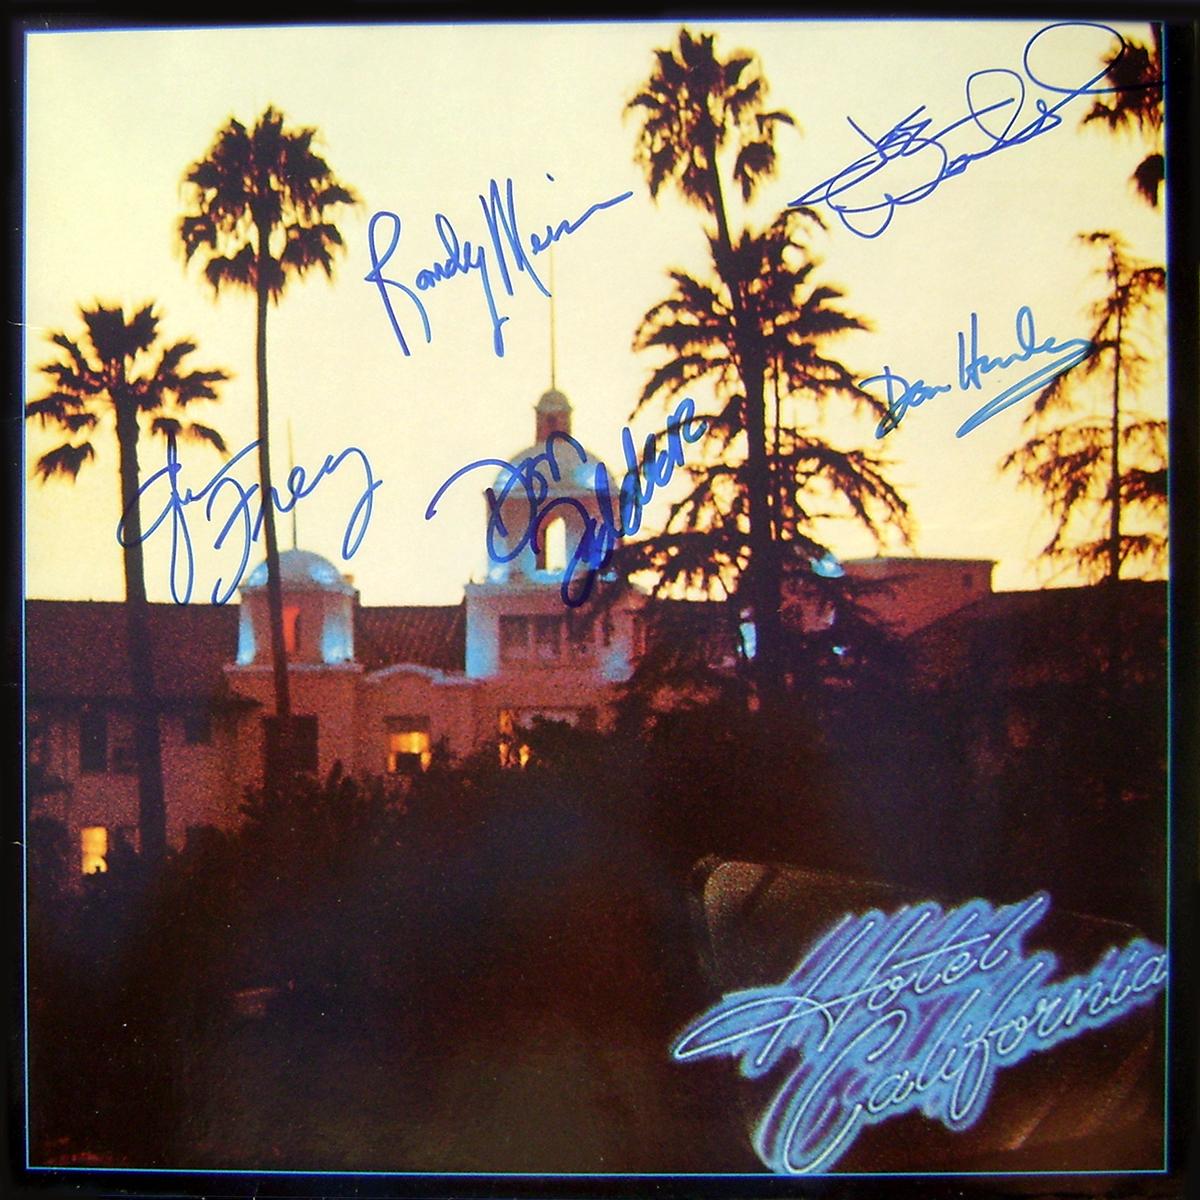 Eagles LP - Hotel California #2